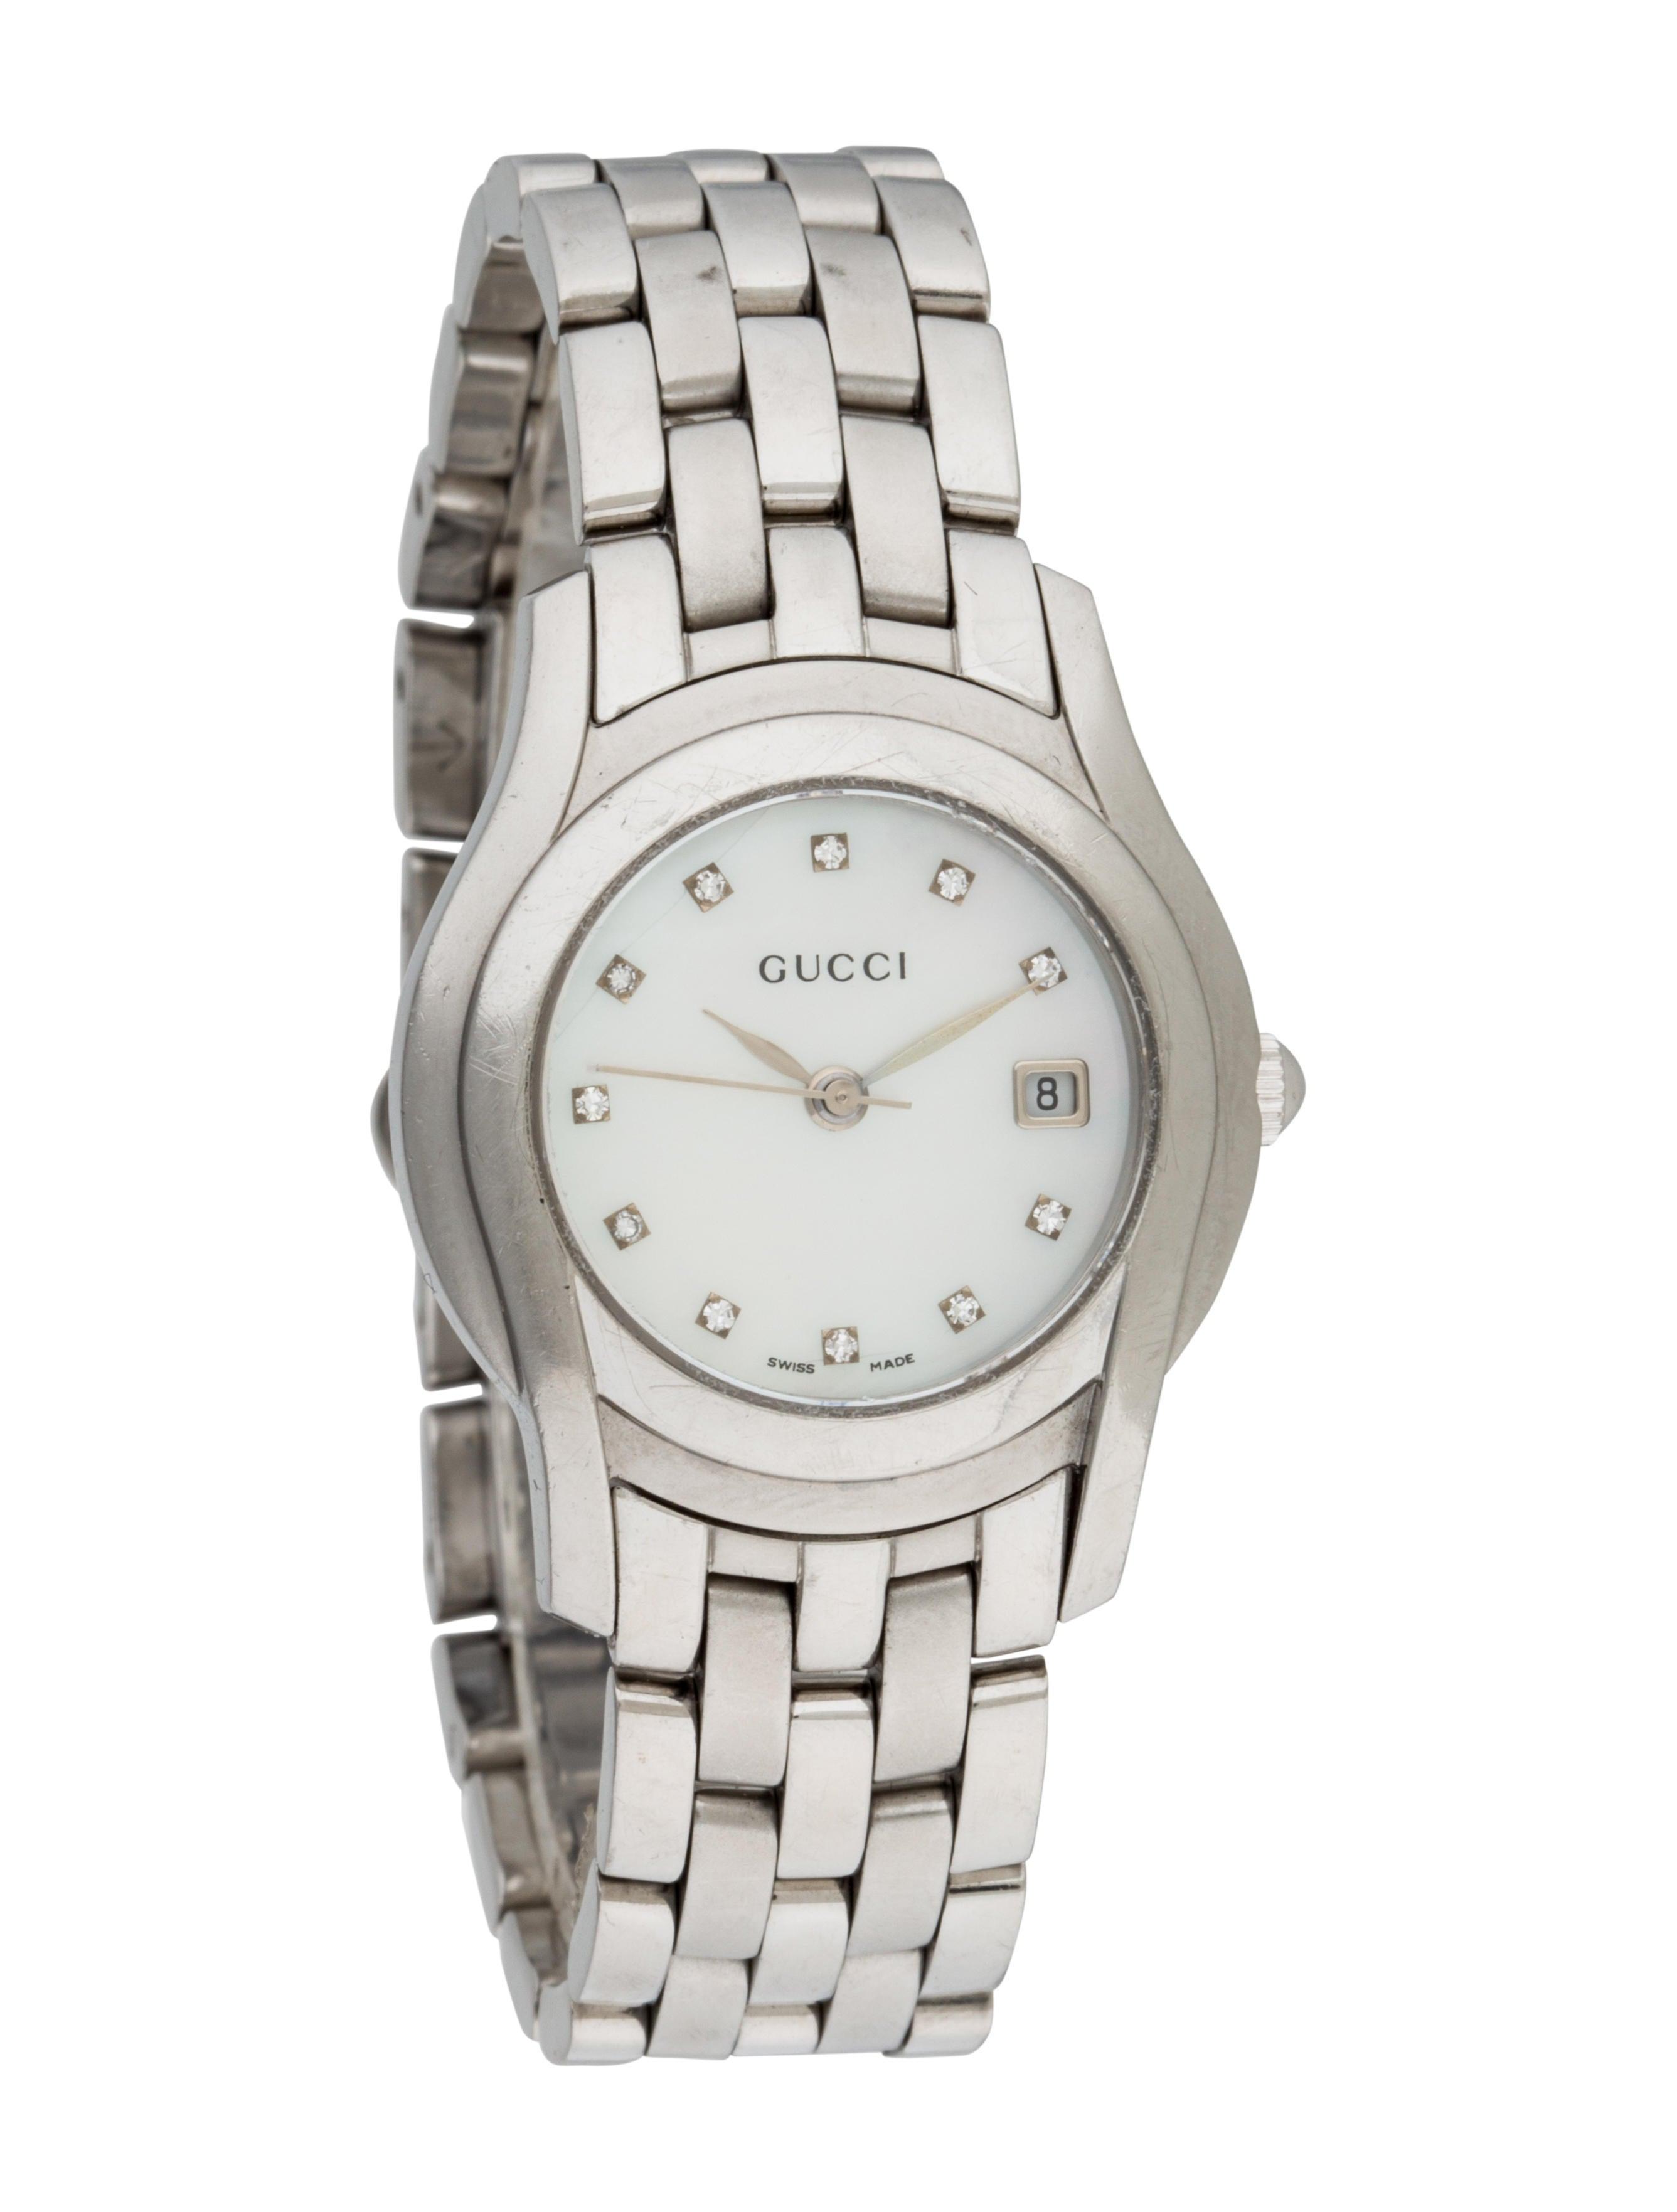 fbd8ab11130 Gucci 5500L Diamond Watch - Bracelet - GUC77390